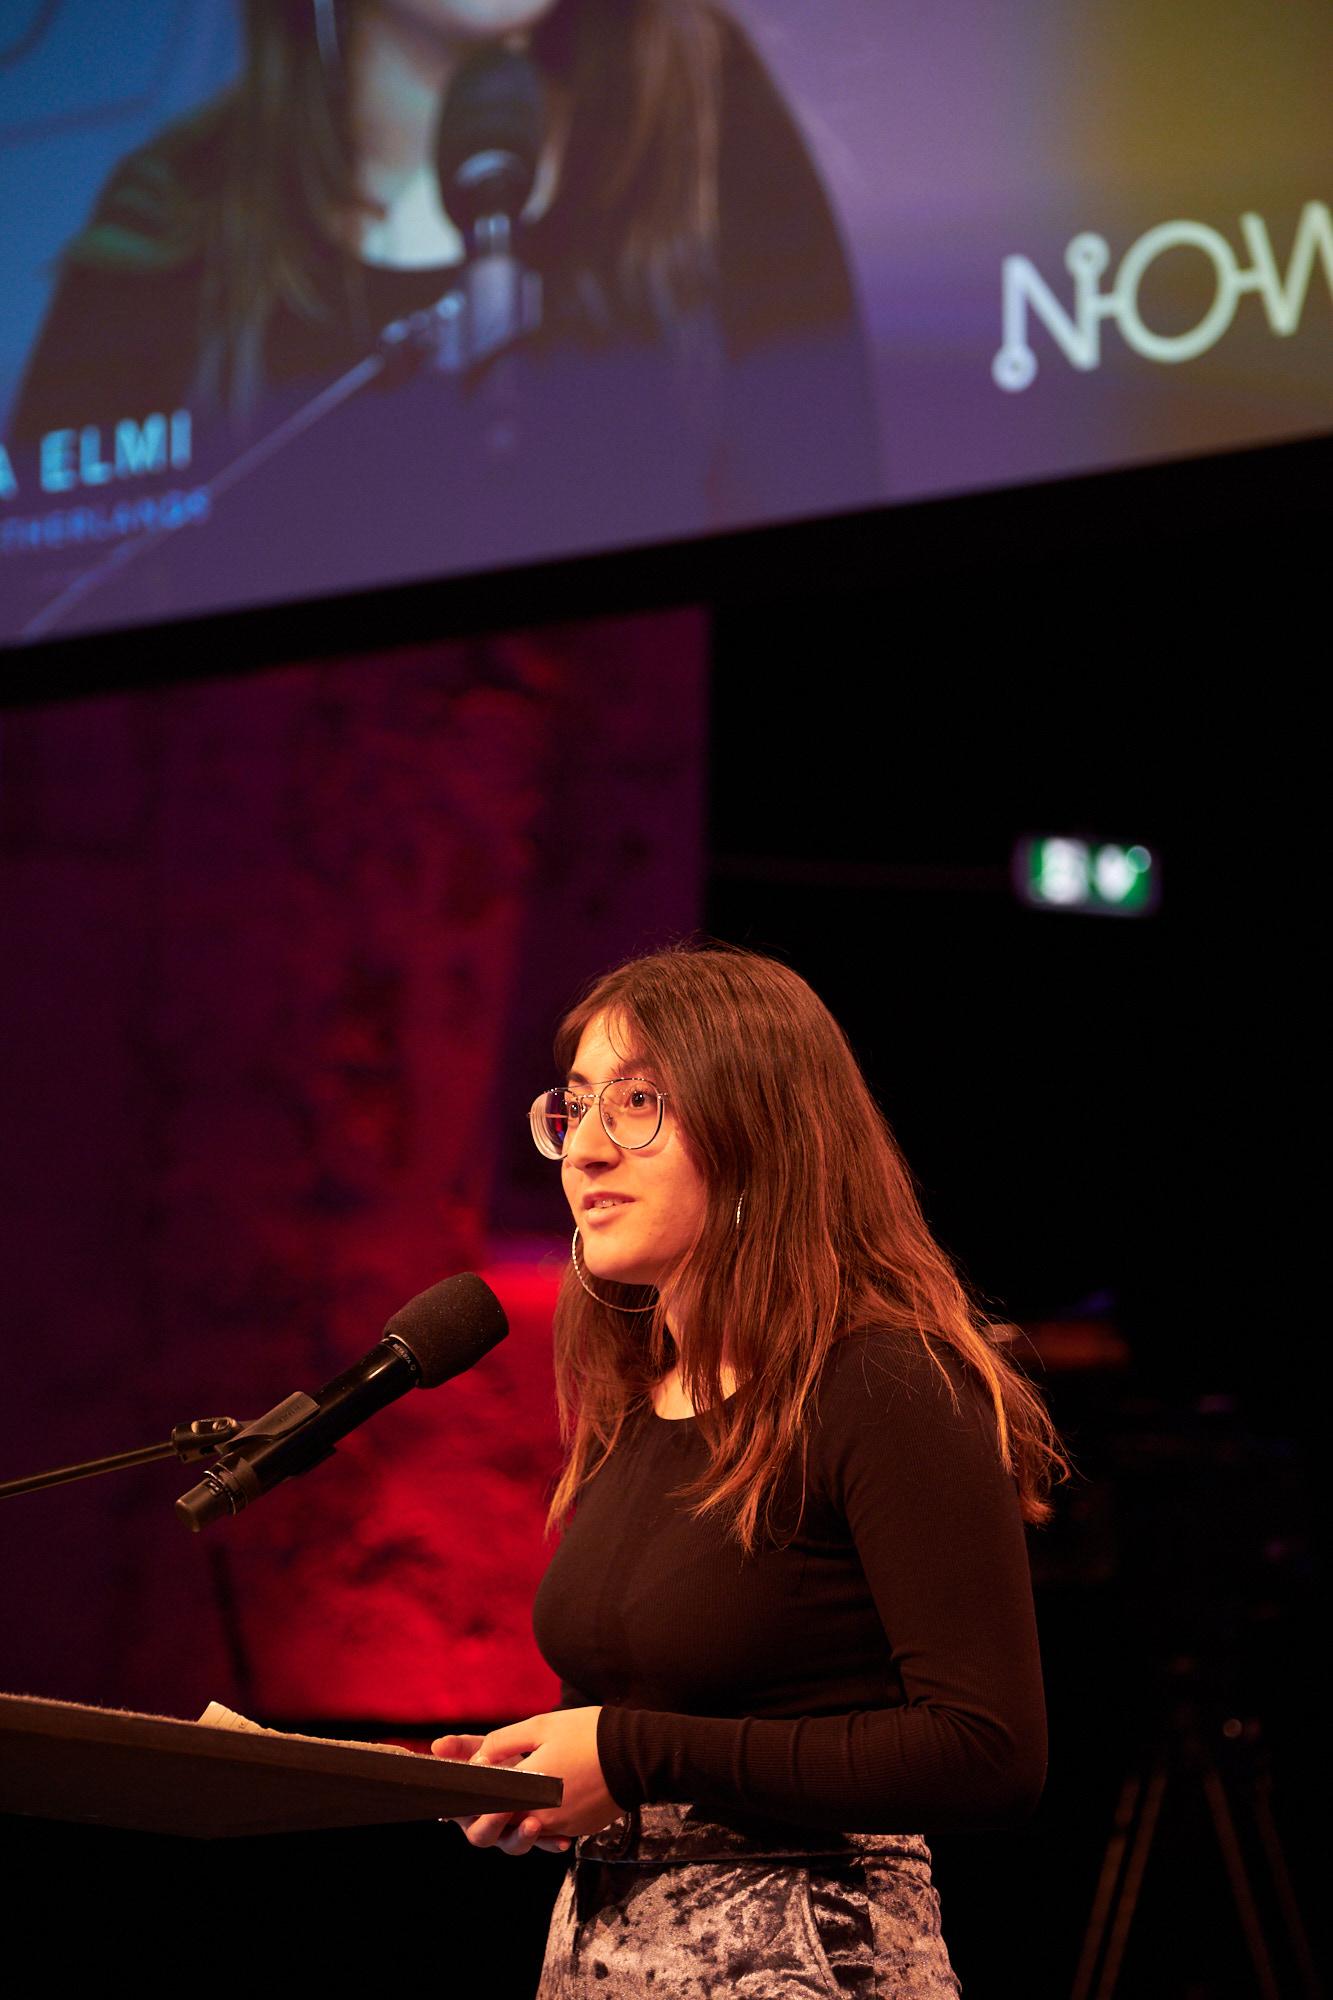 Fahima Elmi